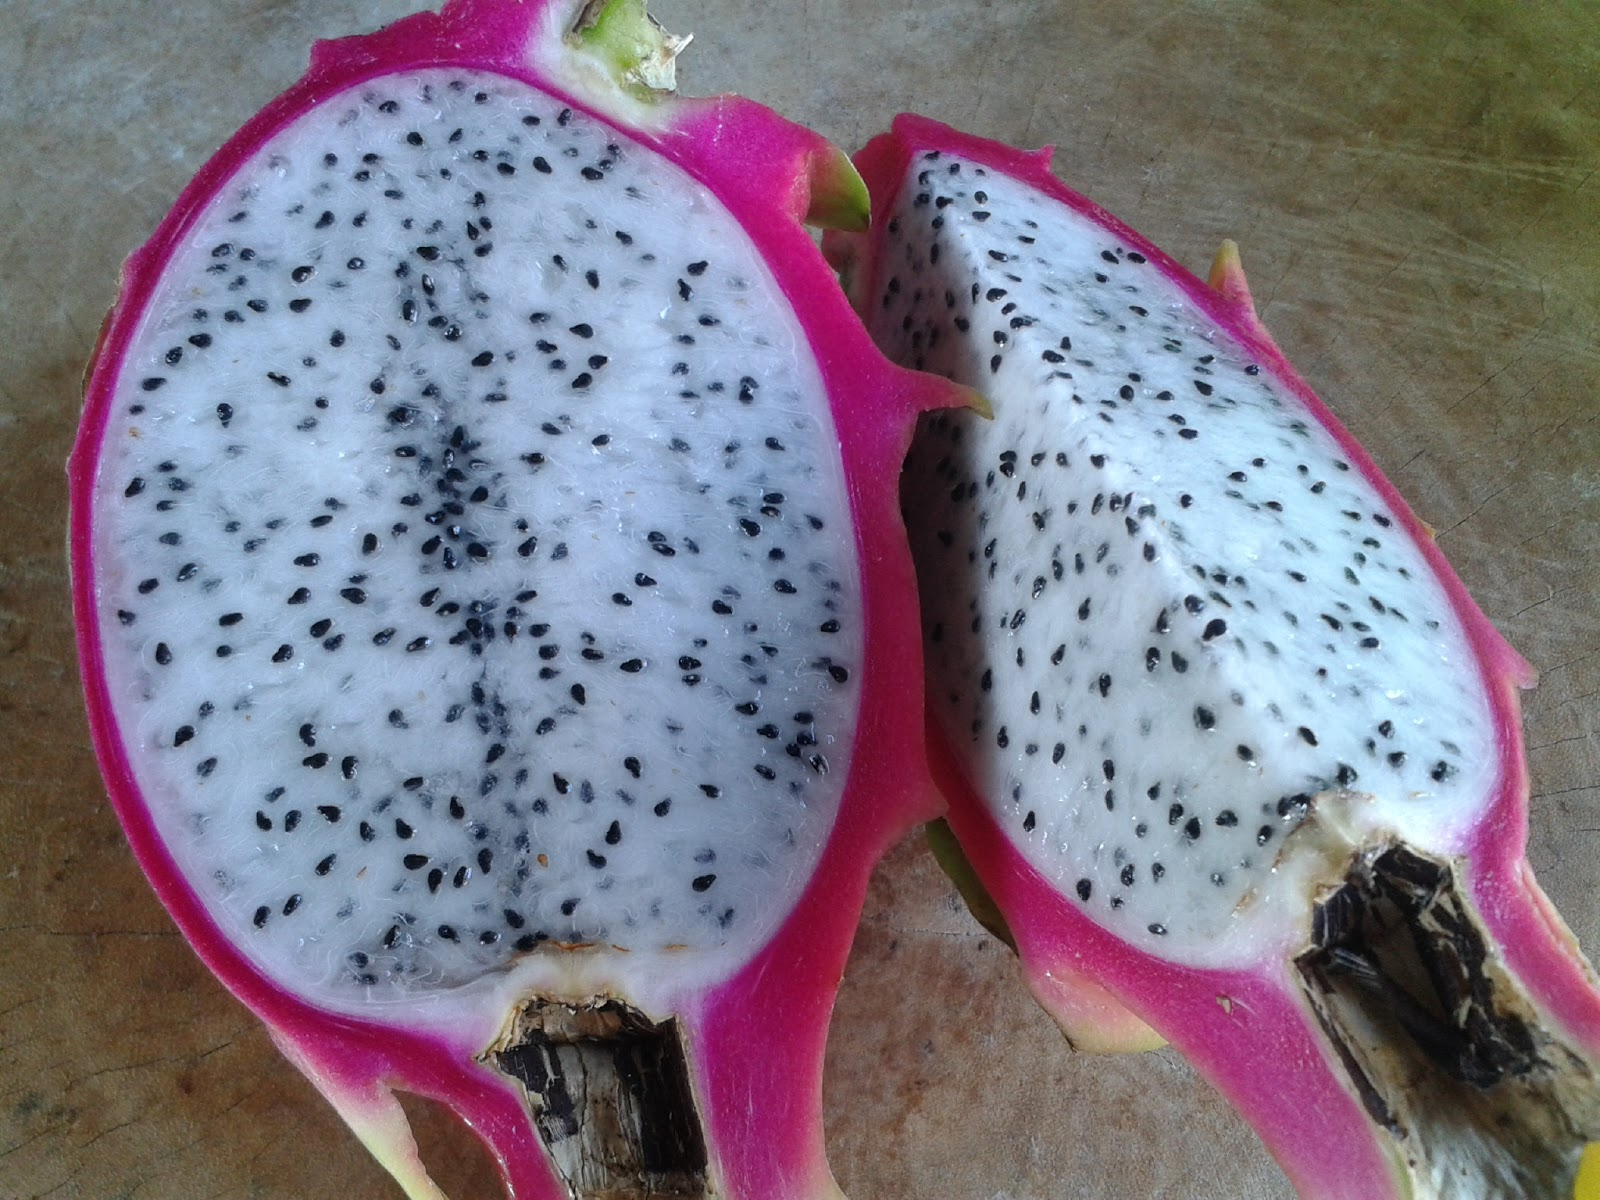 Pulp Of White Dragon Fruit